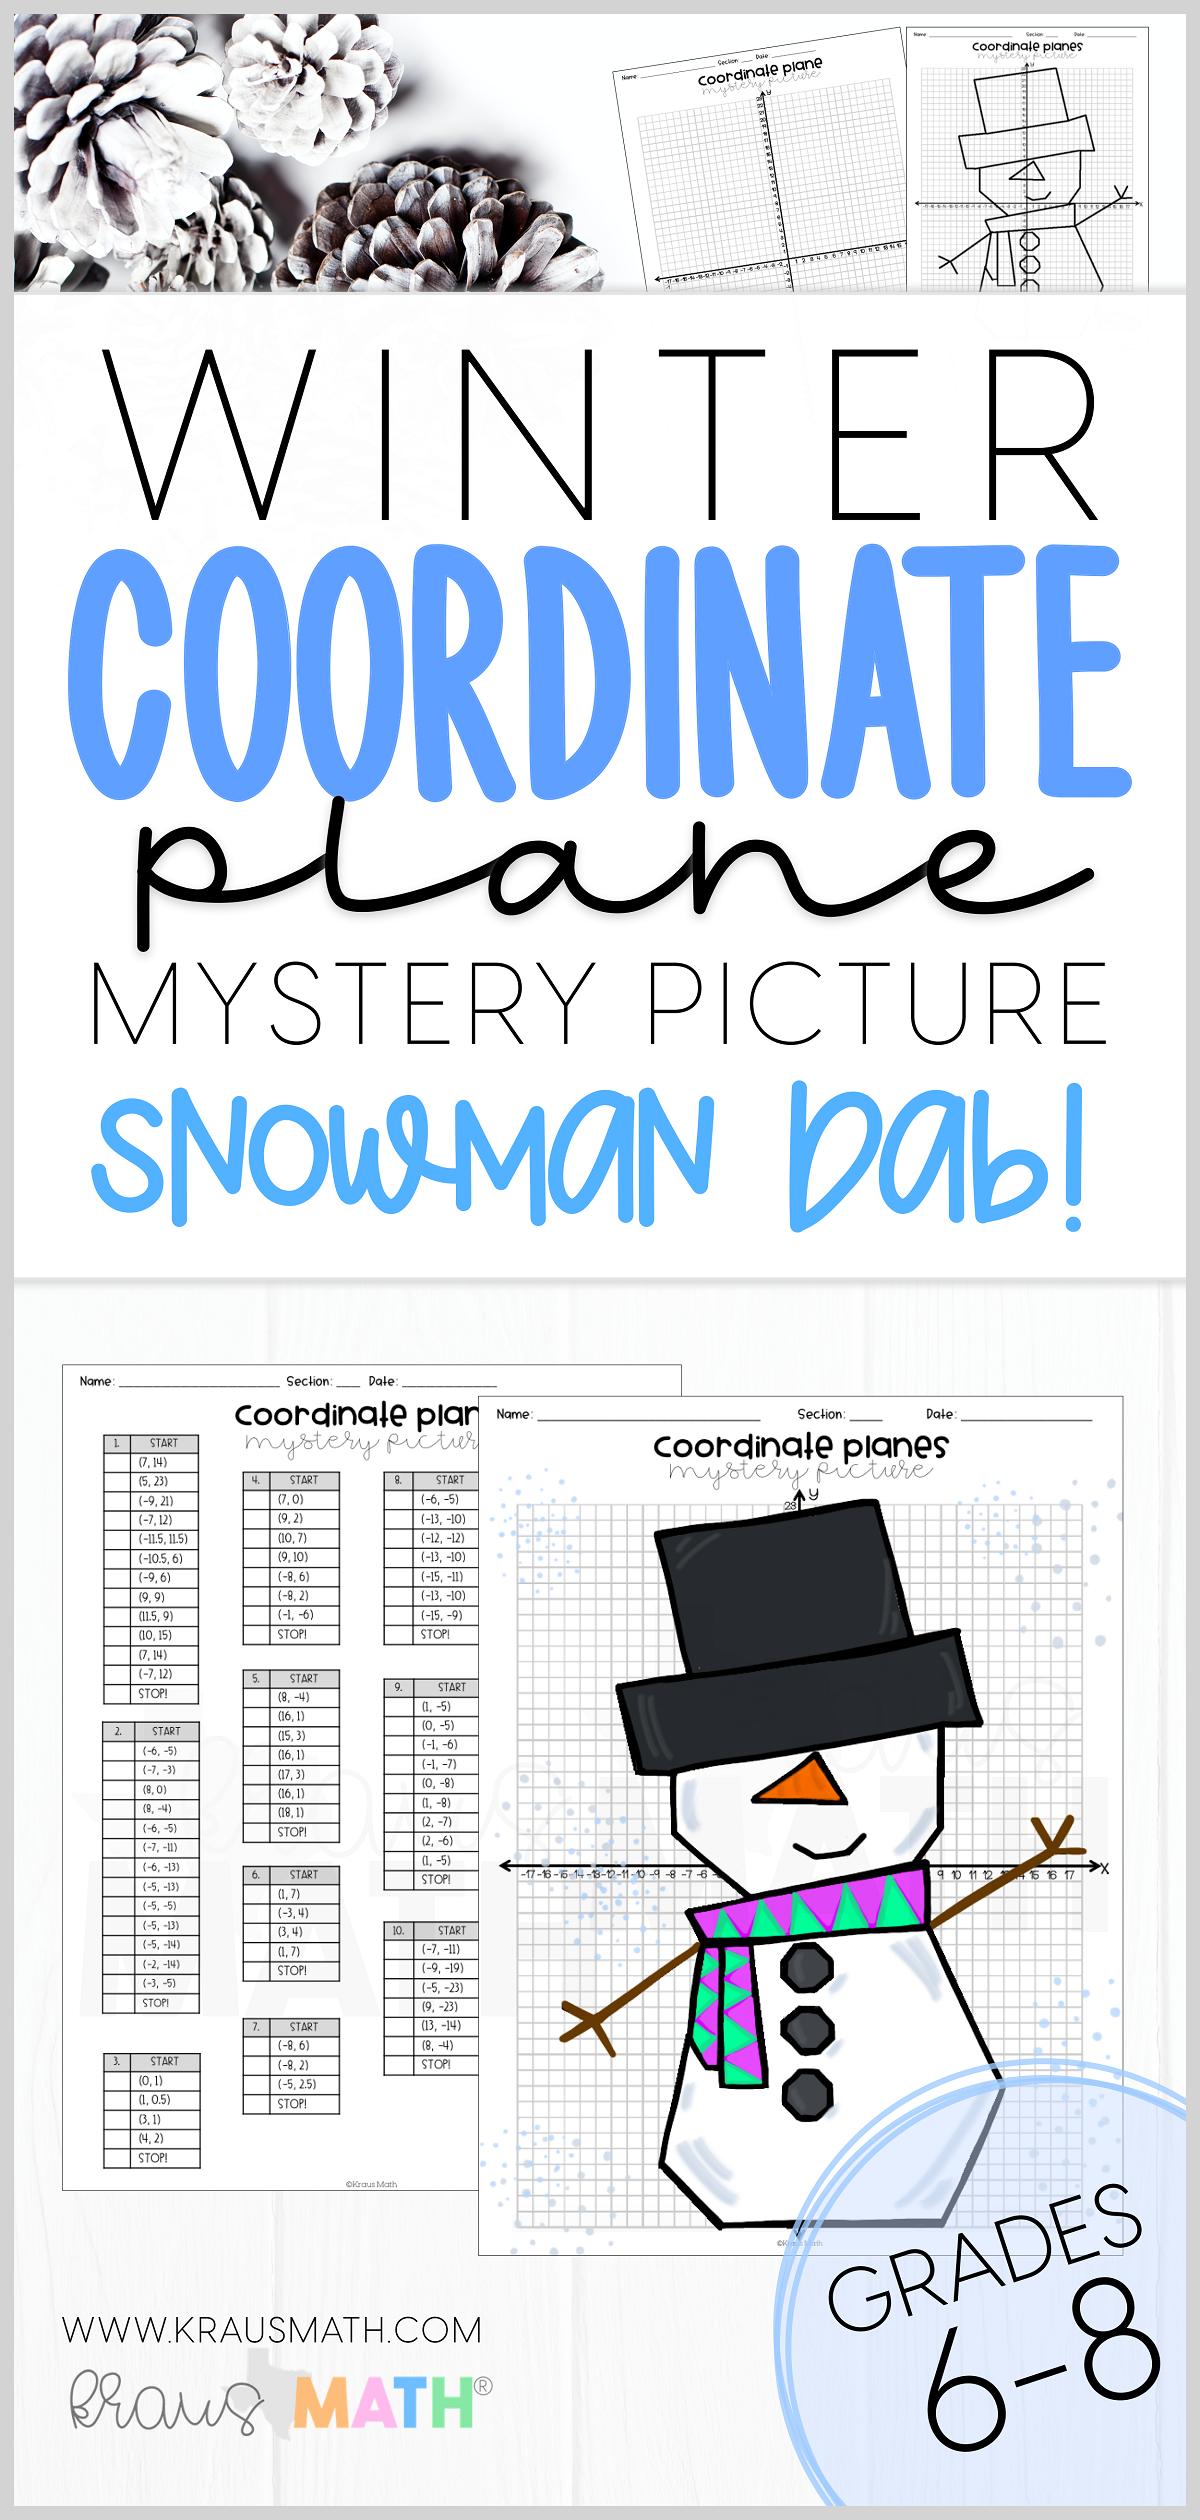 Winter Holiday Bundle 1 Coordinate Plane Activity Kraus Math Classroom Fun Fun Math Activities Fun Math Worksheets [ 2520 x 1200 Pixel ]